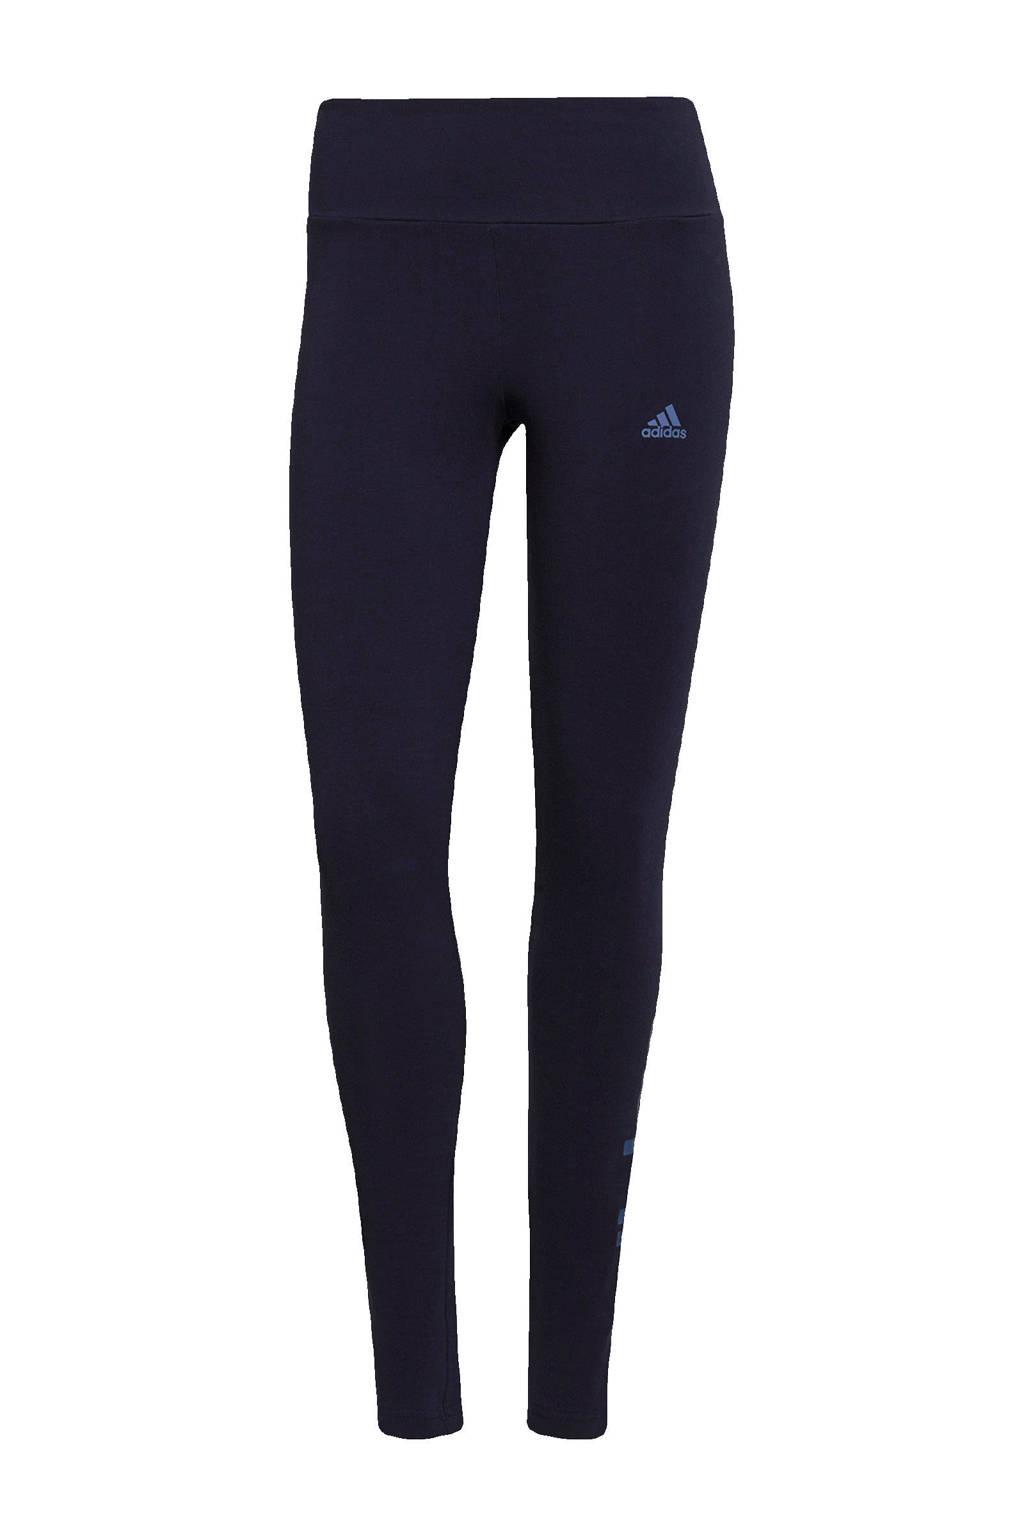 adidas Performance sportlegging donkerblauw/blauw, Donkerblauw/blauw